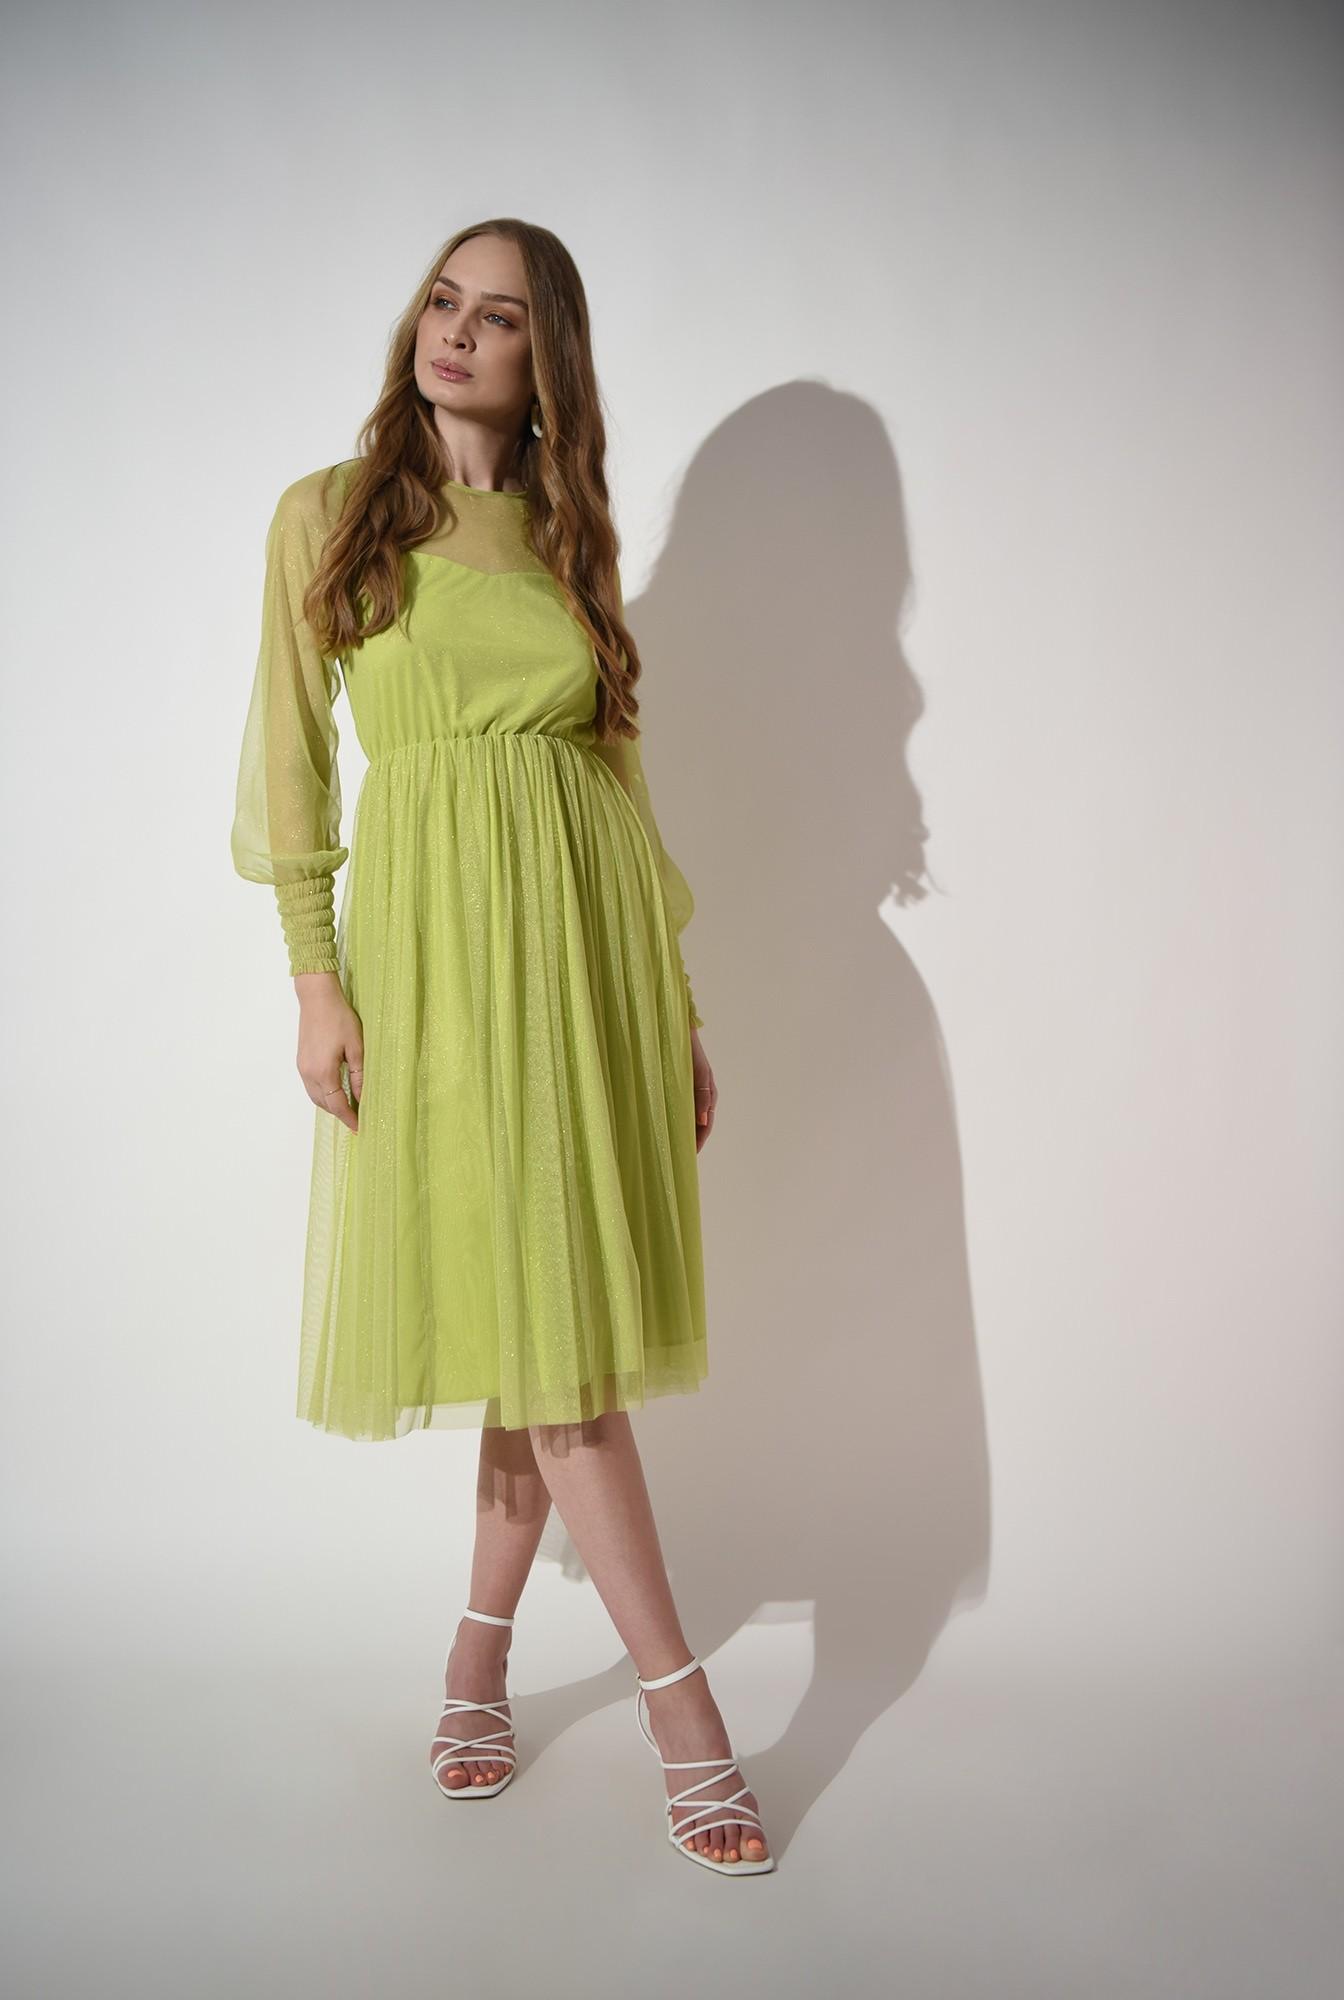 1 - rochie verde, eleganta, stransa la talie